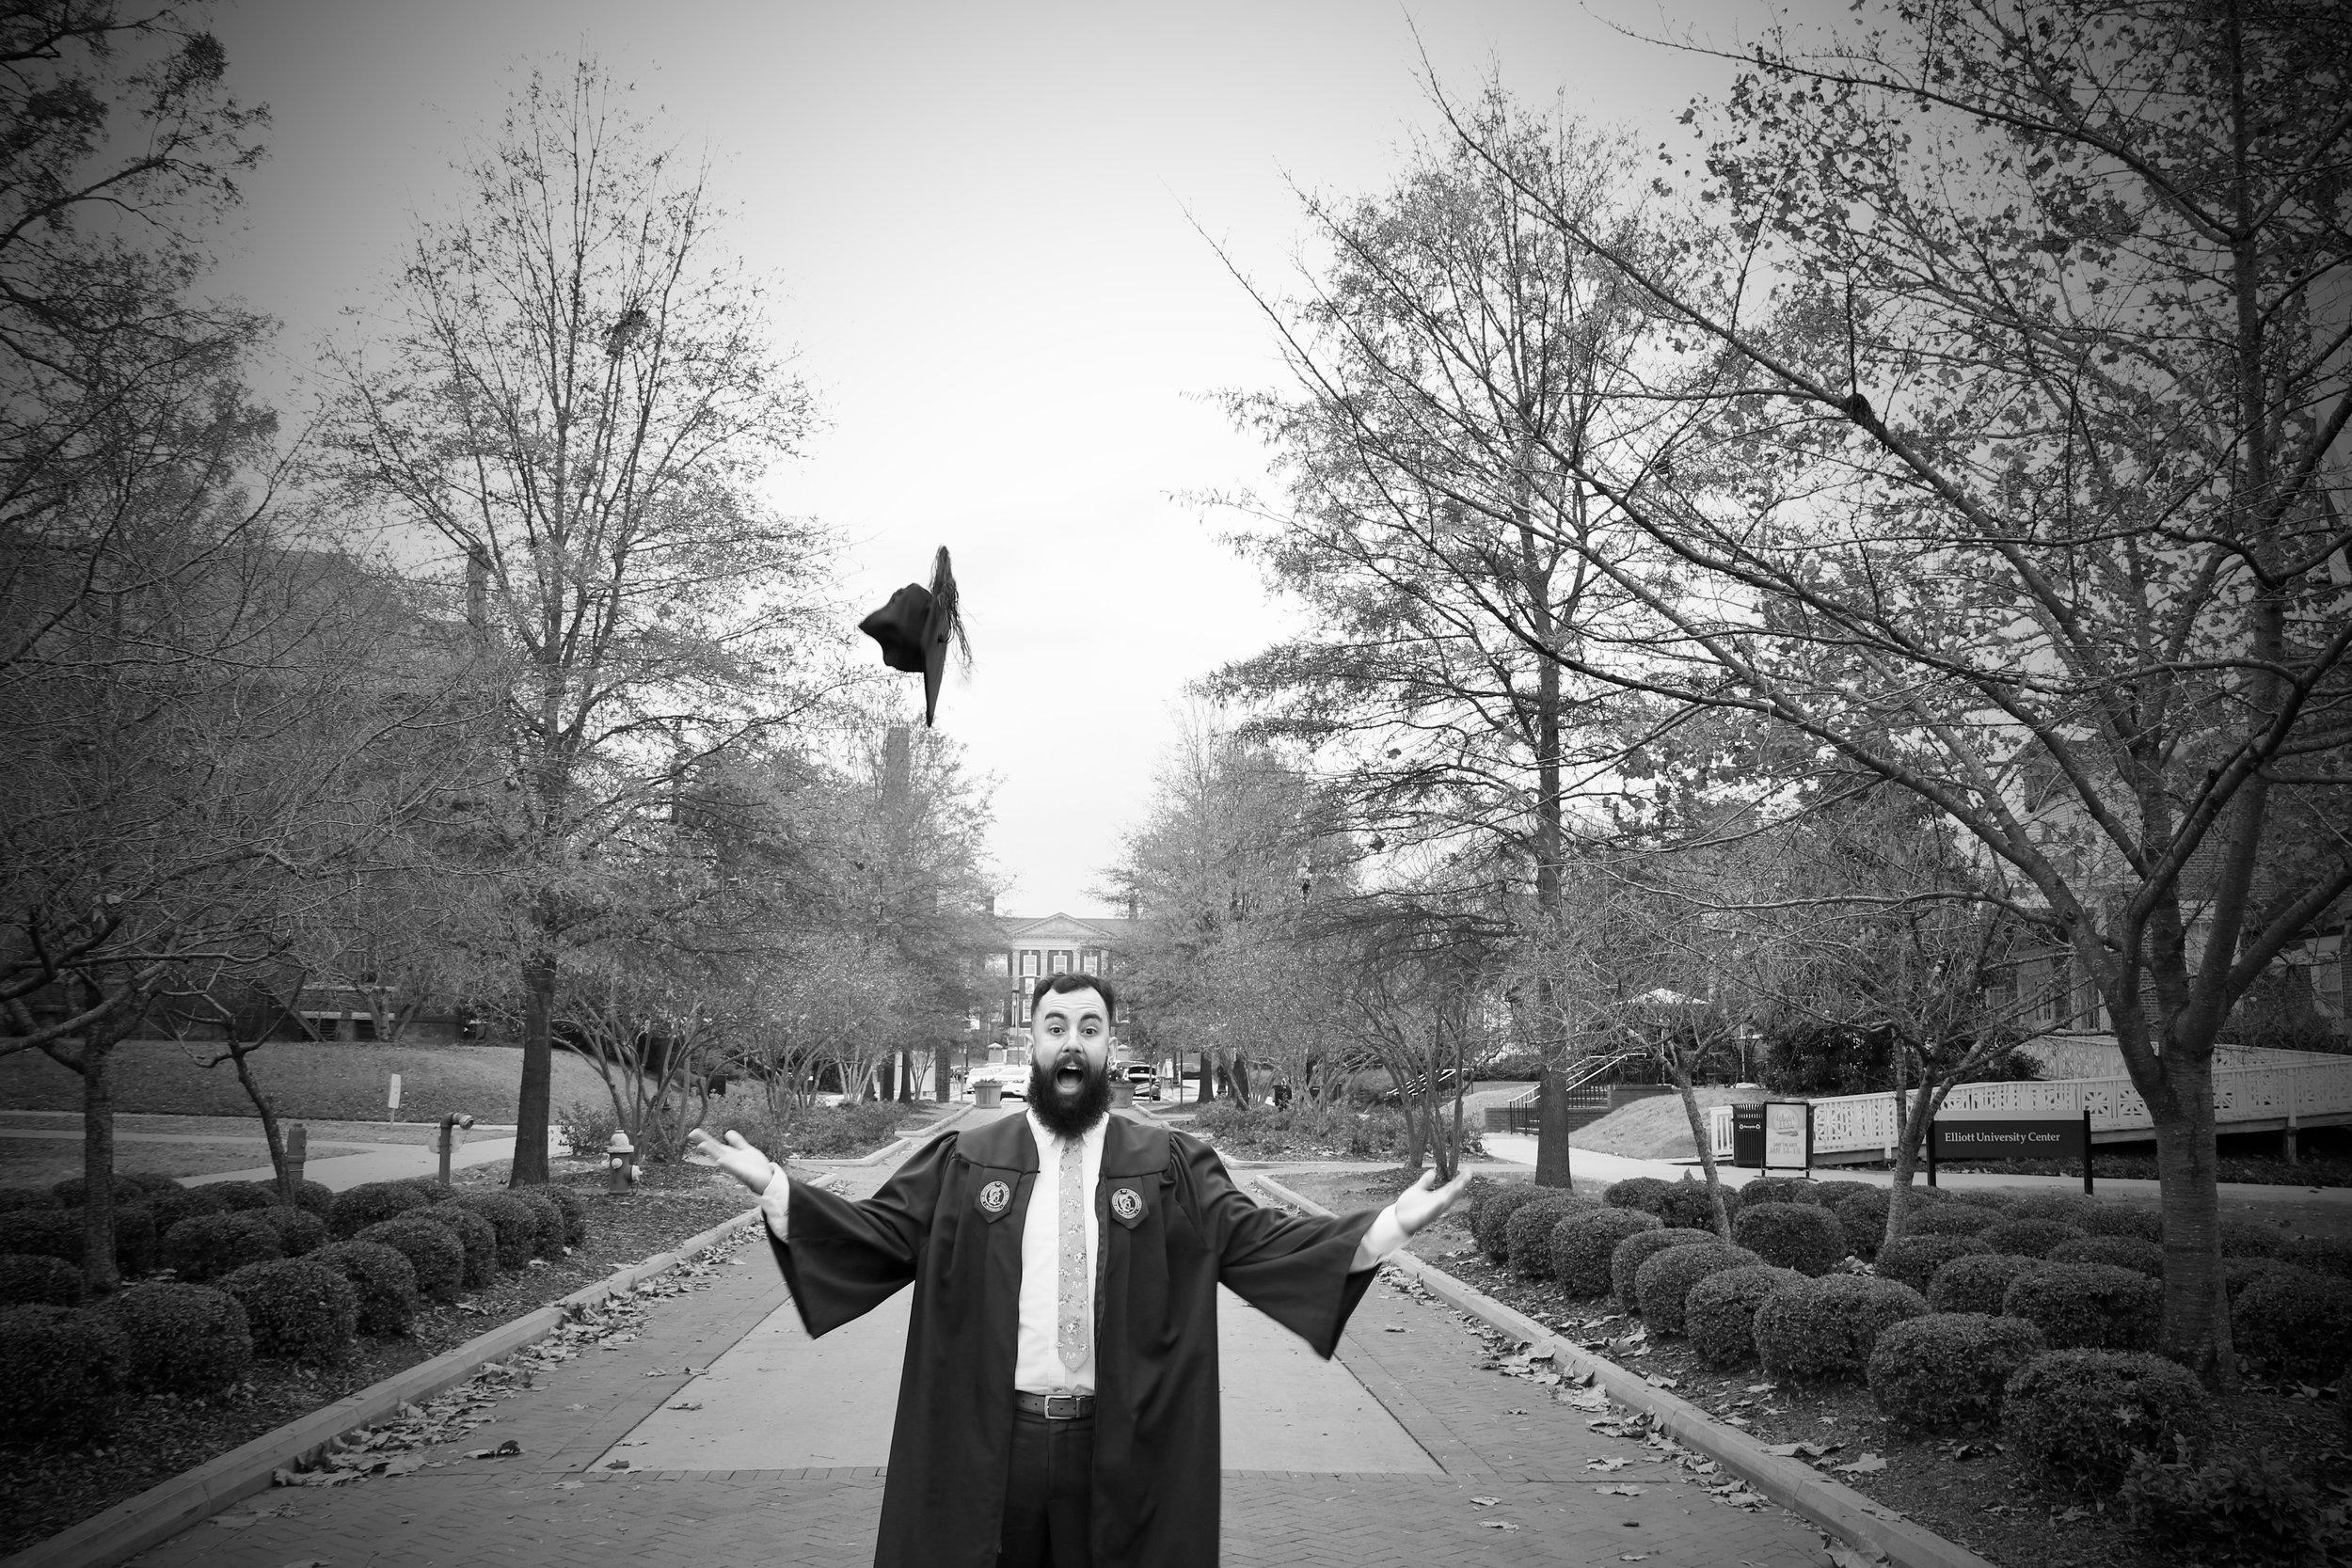 David White - Graduation December 2018